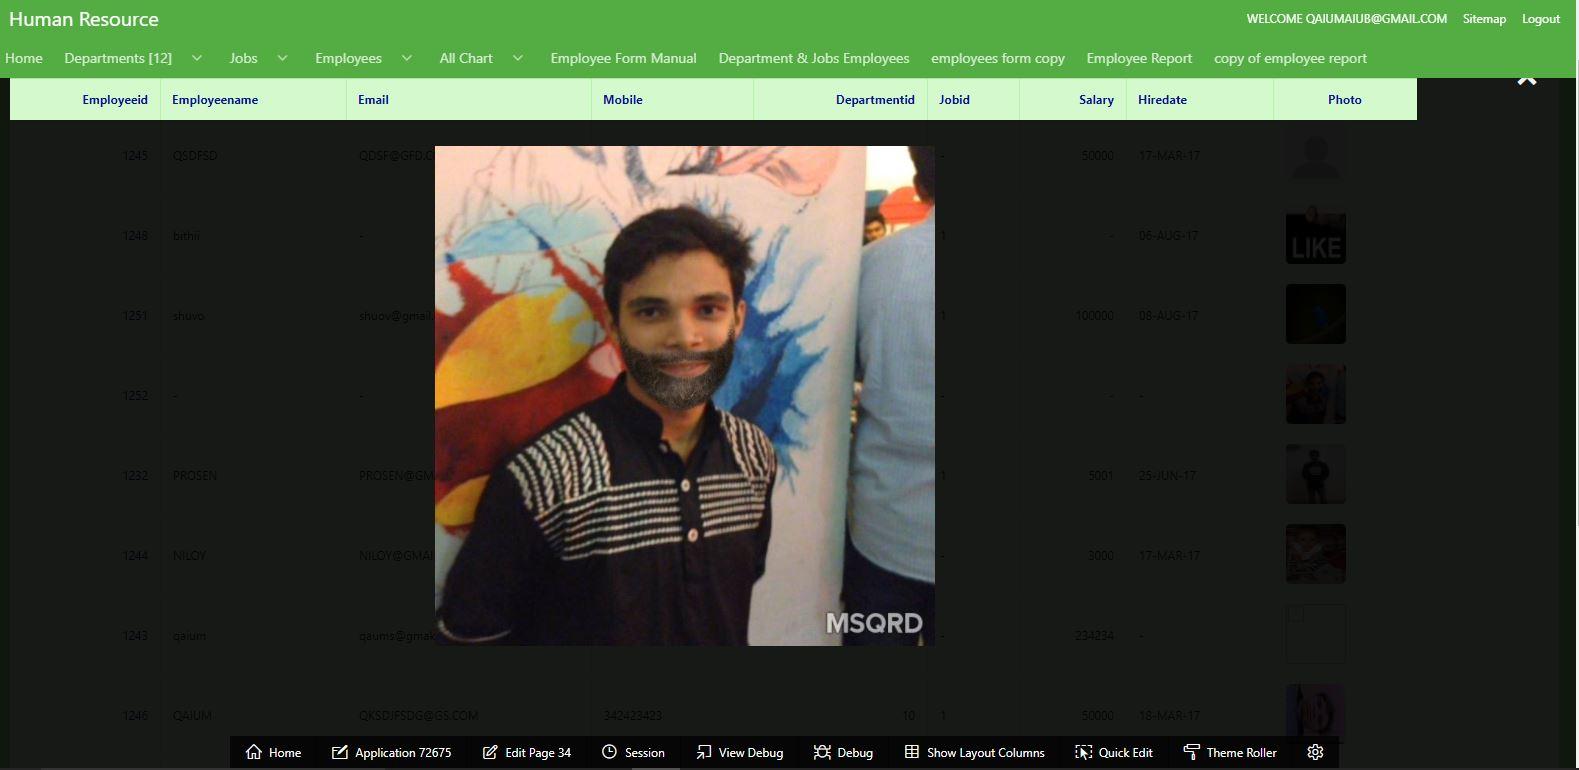 Qaium's IT Demonstration: Modal Images / Large Image / Image Zoom